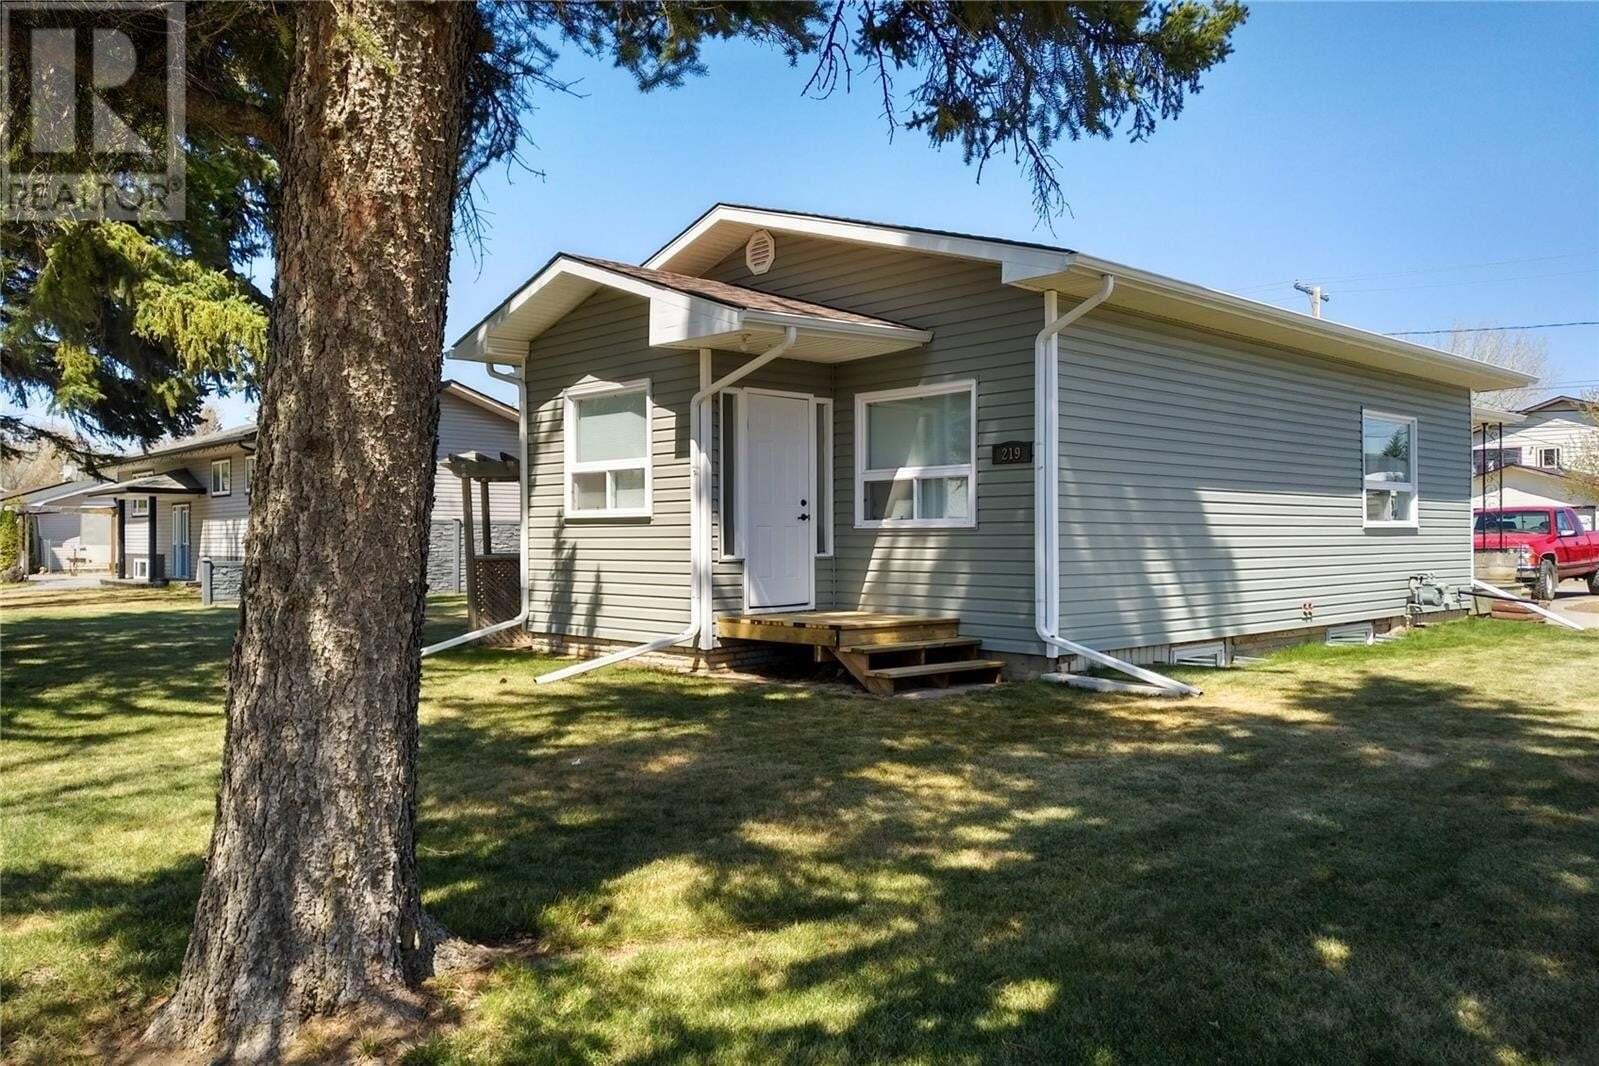 House for sale at 219 1st St E Langham Saskatchewan - MLS: SK827465